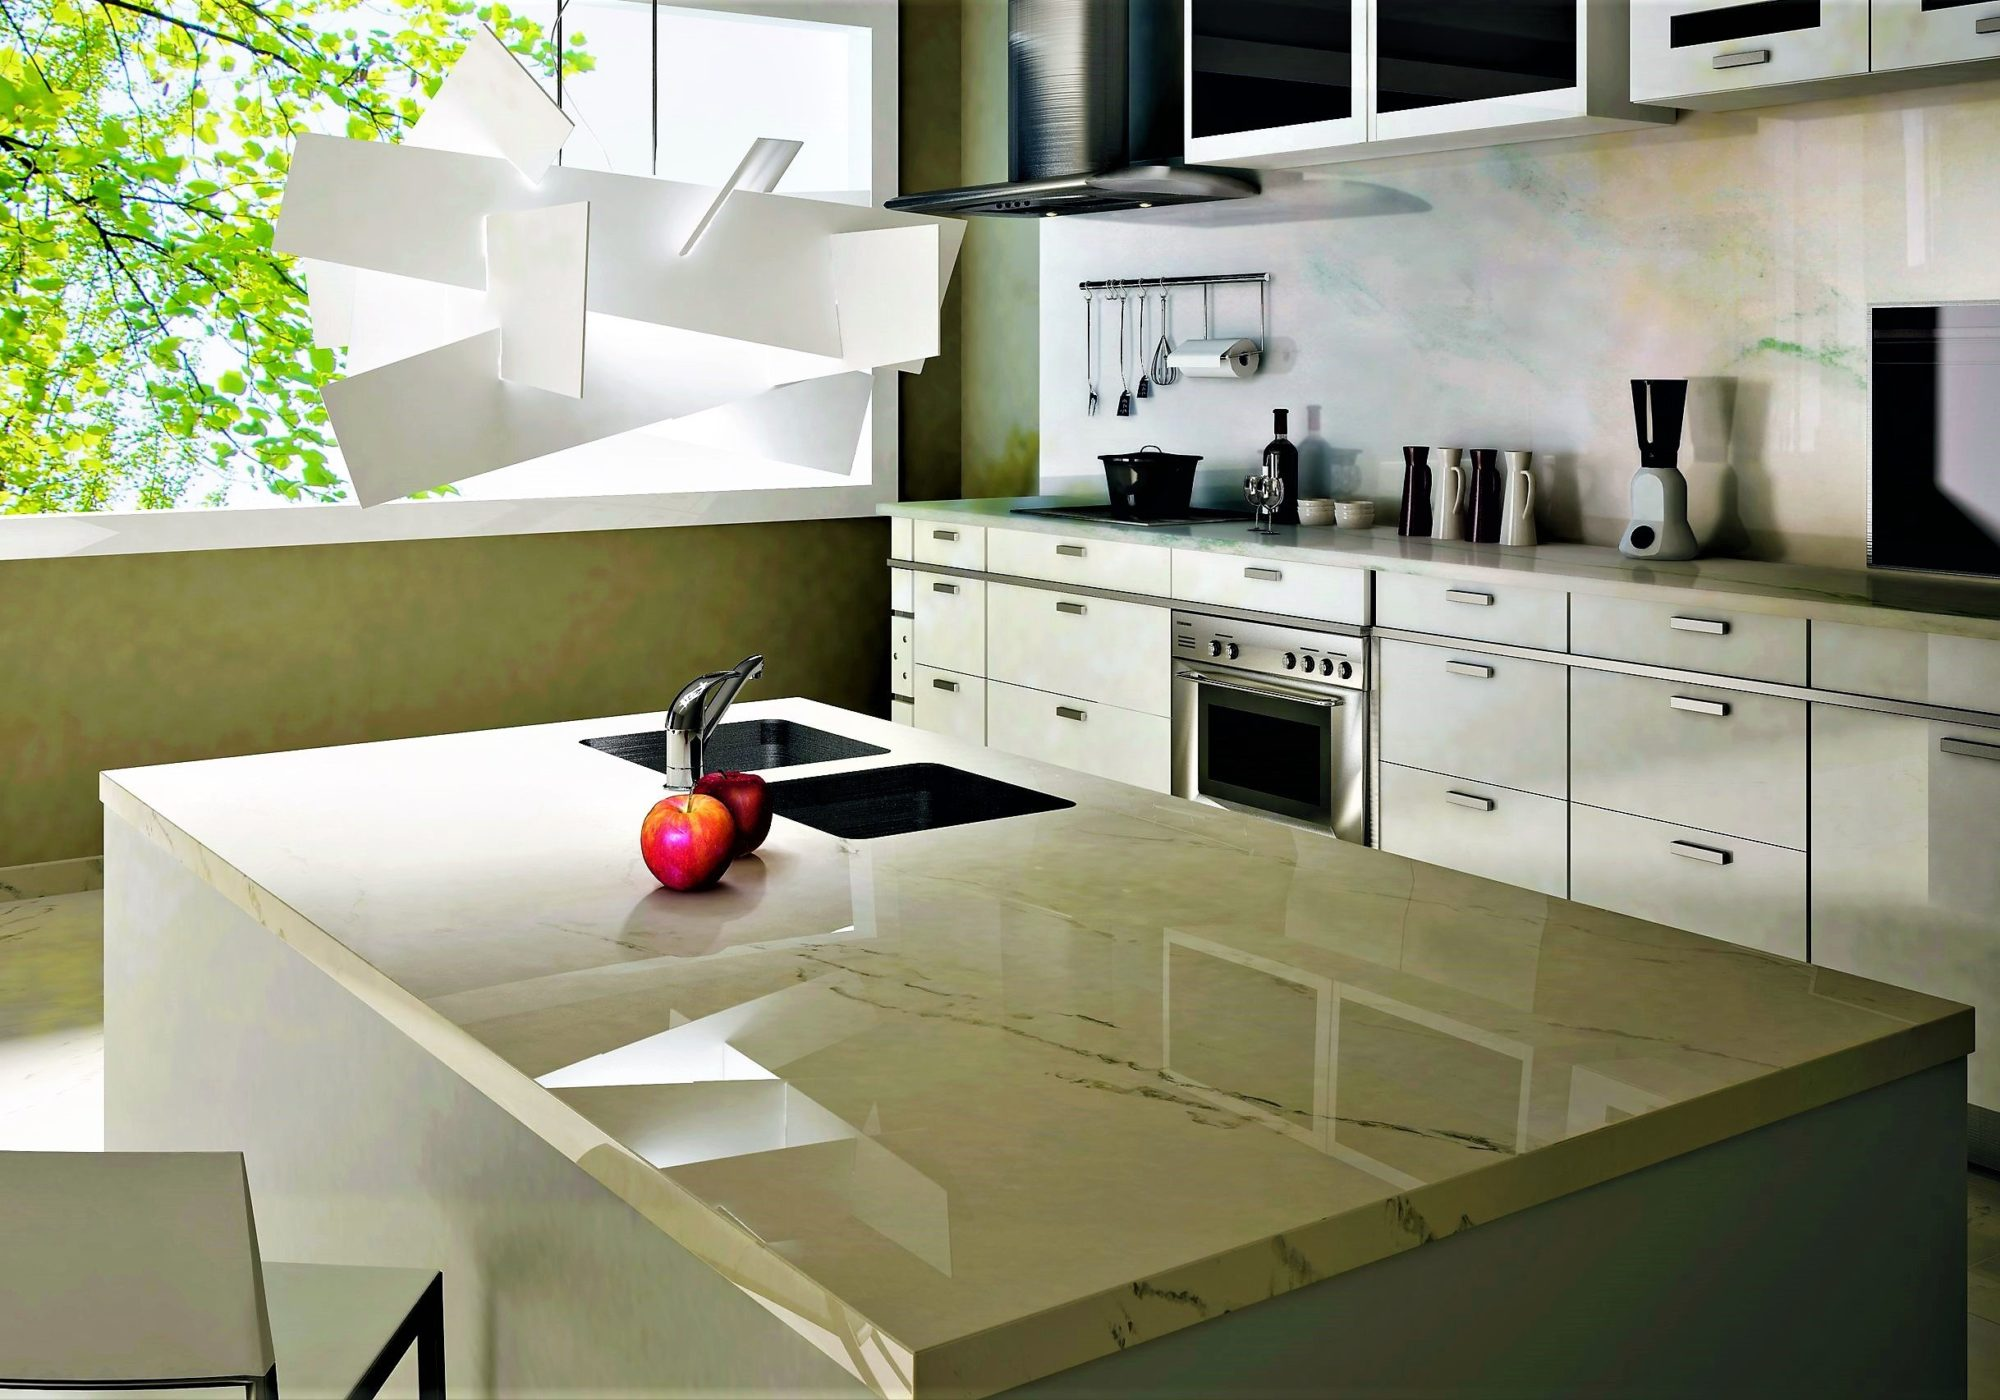 Full Size of Preise Arbeitsplatten Küche Moderne Arbeitsplatten Küche Arbeitsplatten Küche Stein Granit Arbeitsplatten Küche Küche Arbeitsplatten Küche